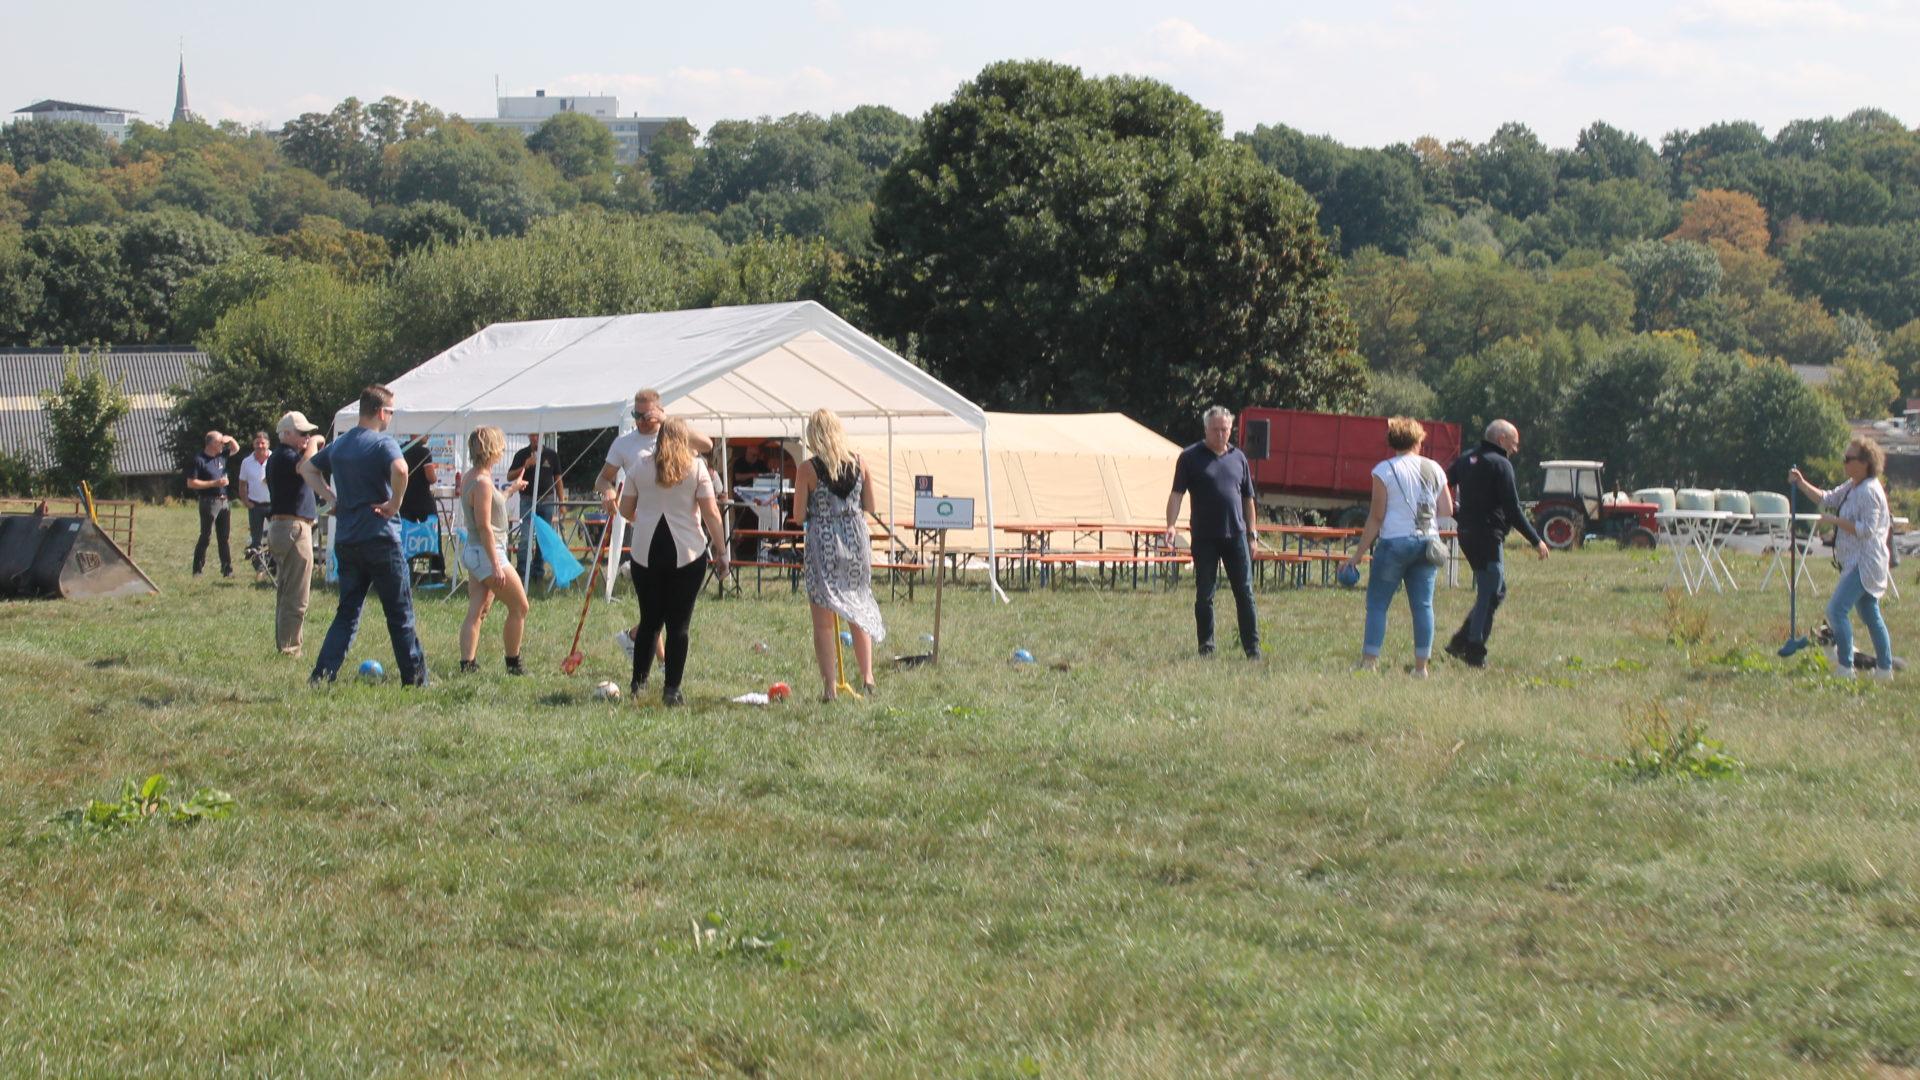 Boerengolftoernooi Kerkrade  |  Het Boerengolf Charity-event van Limburg